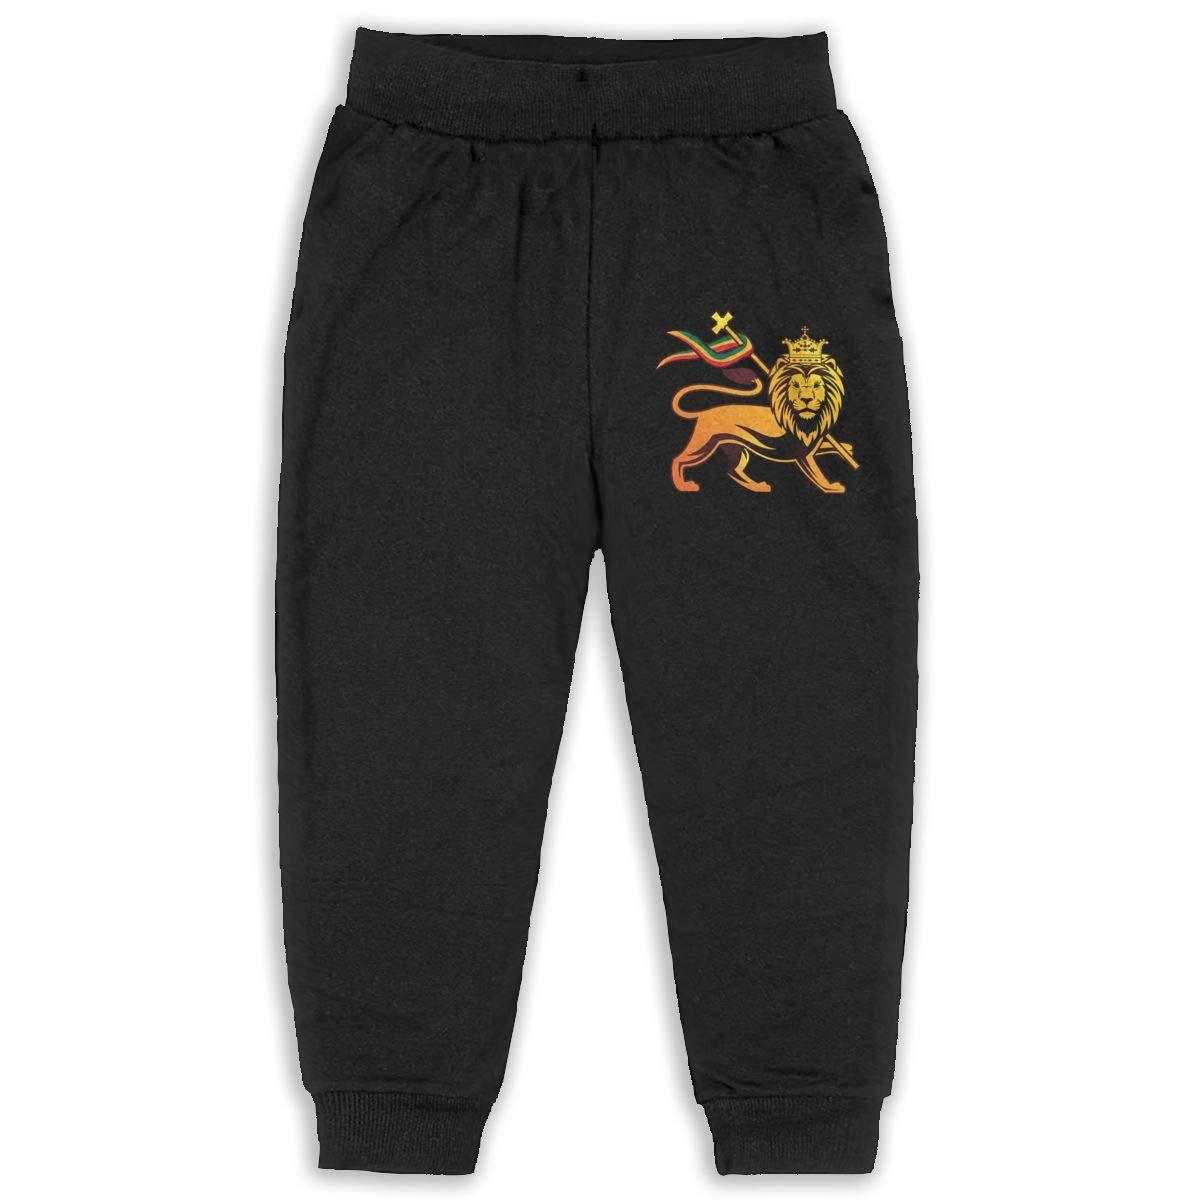 BABALOVE Rasta Lion Judah Youth Soft and Cozy Sweatpants